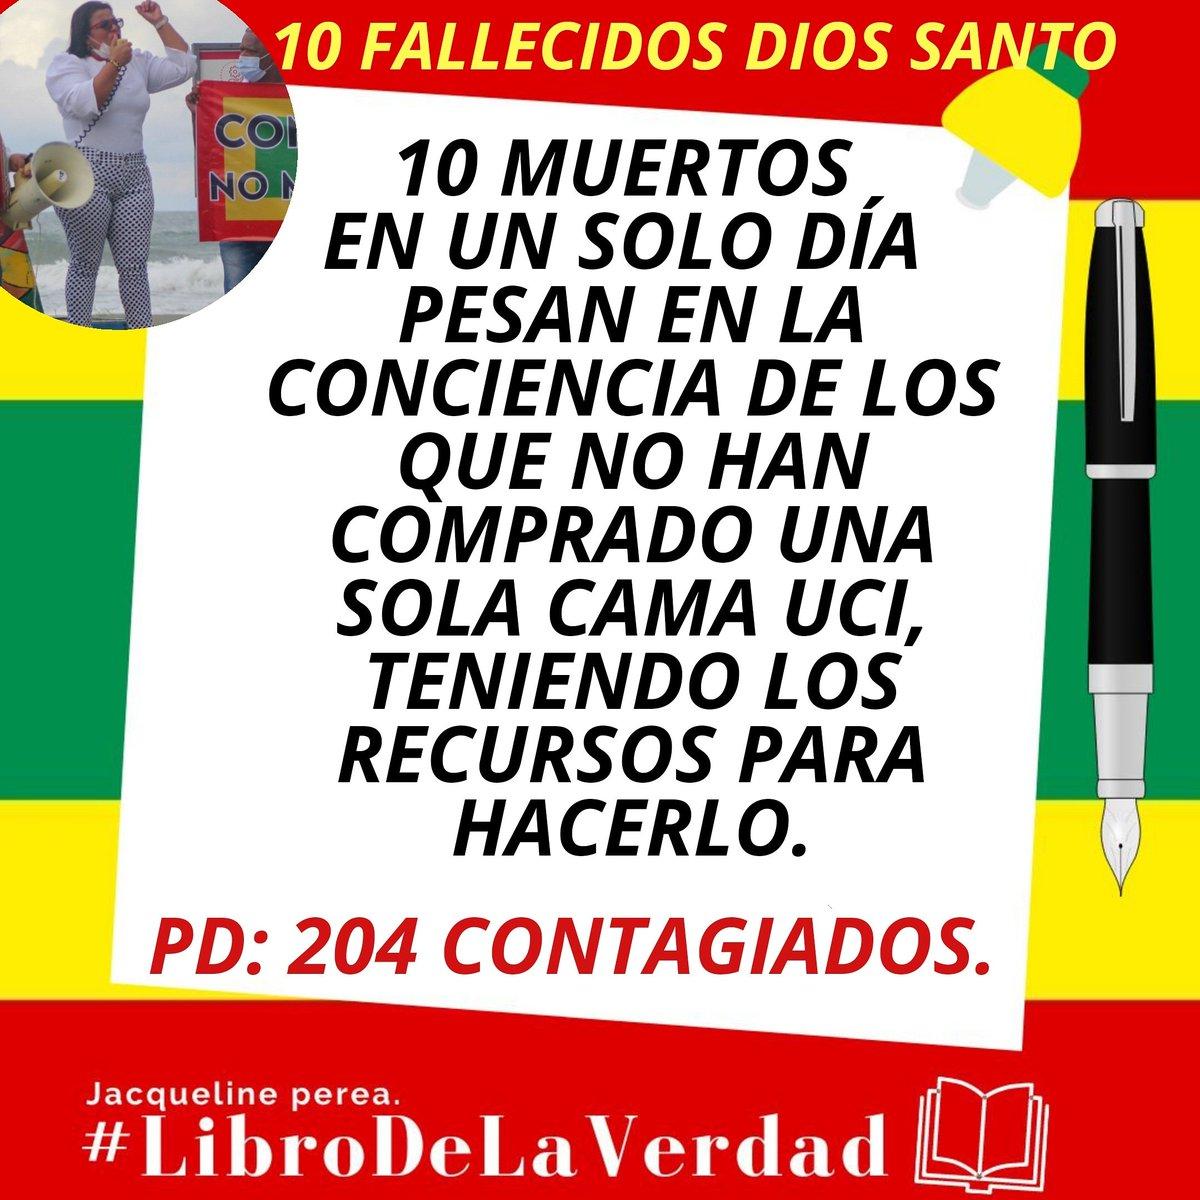 #SOSCARTAGENA @AlcaldiaCTG @daulaw @MinSaludCol @IvanDuque